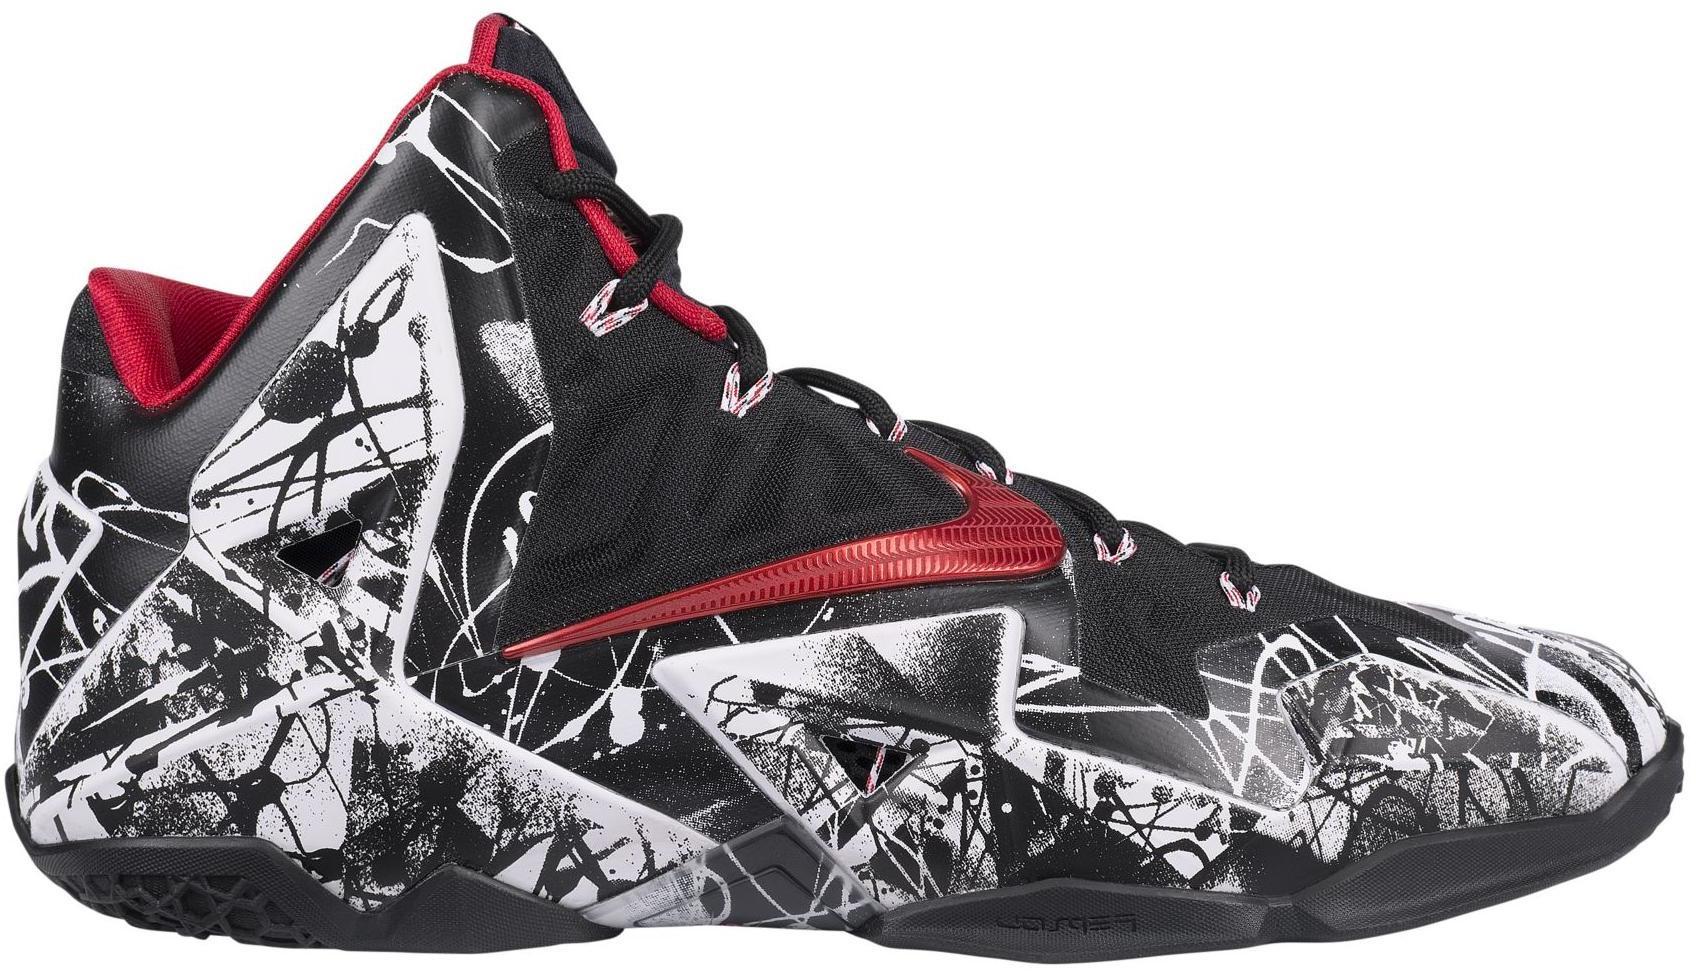 Buy Nike LeBron 11 Shoes \u0026 Deadstock